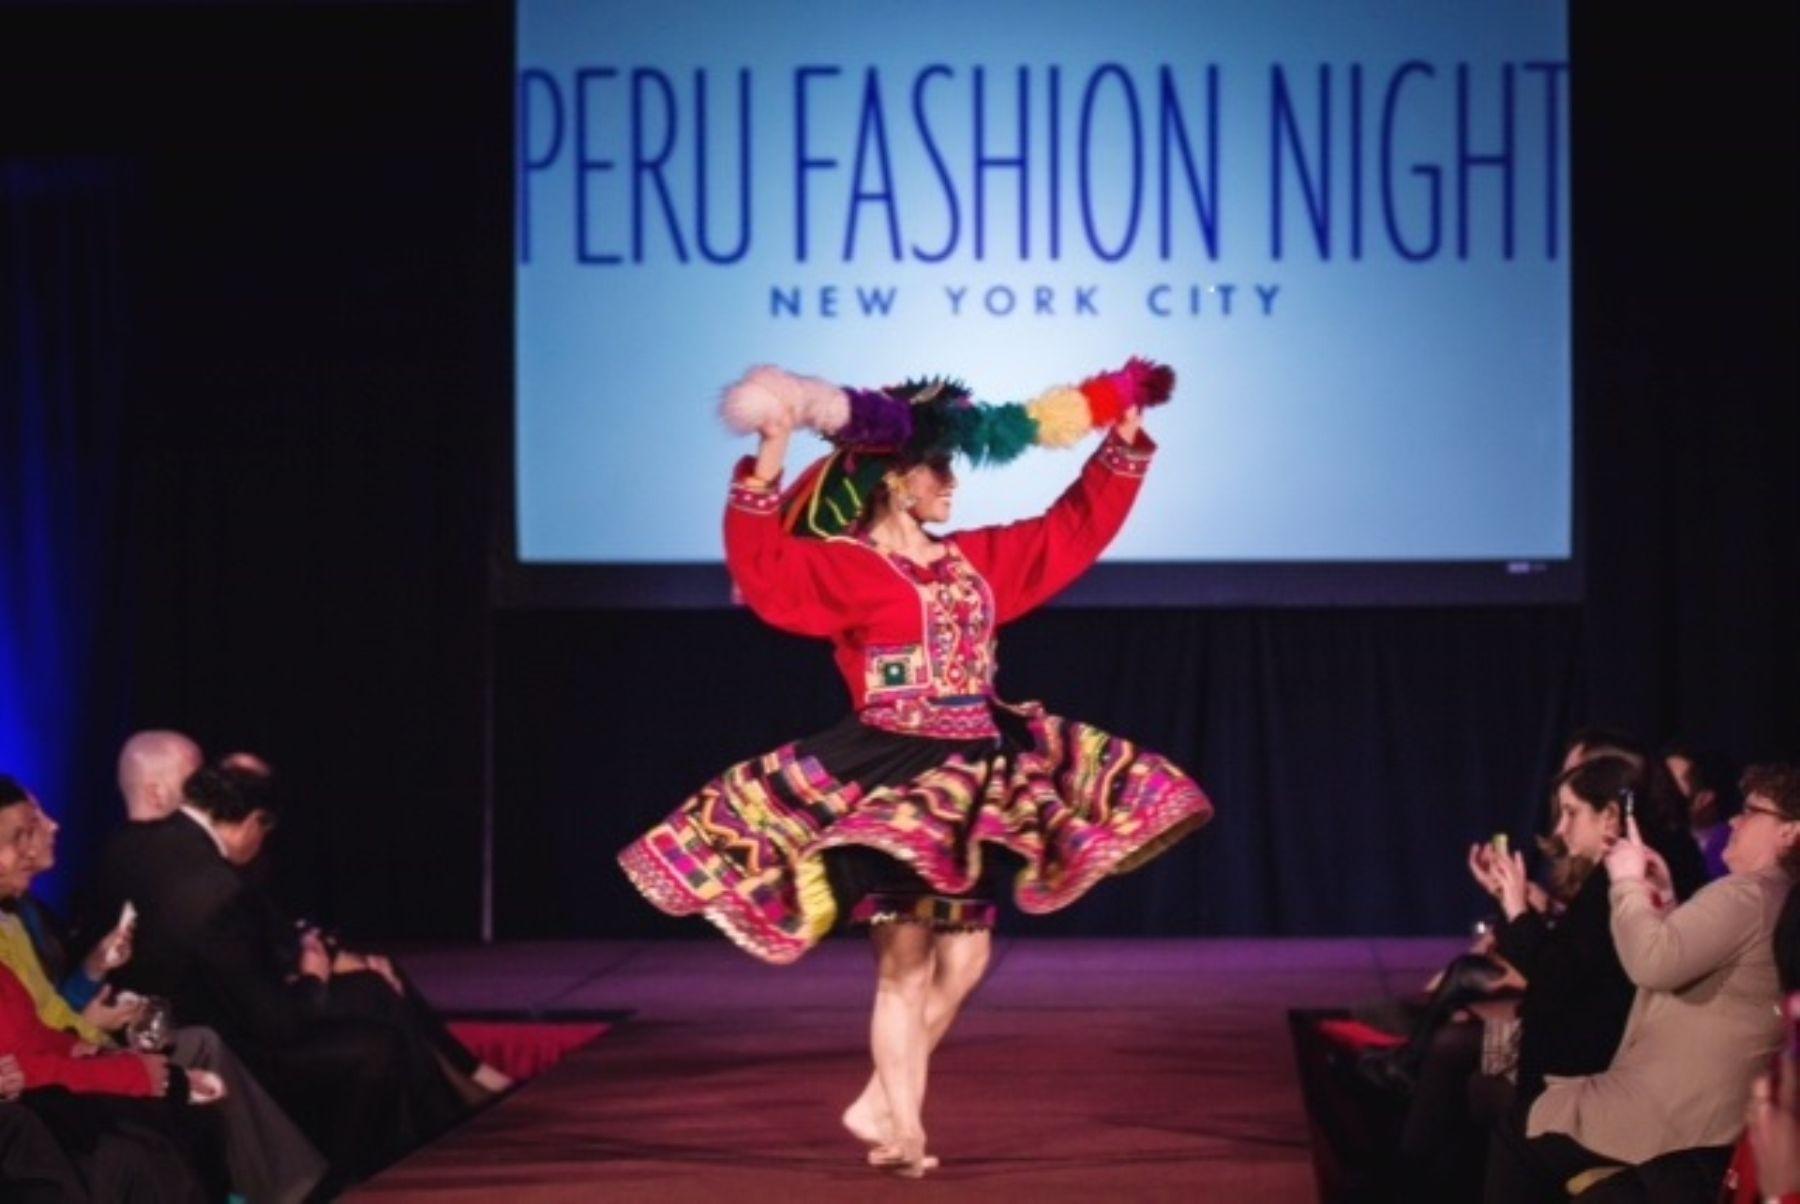 Peru Fashion Night in New York City.